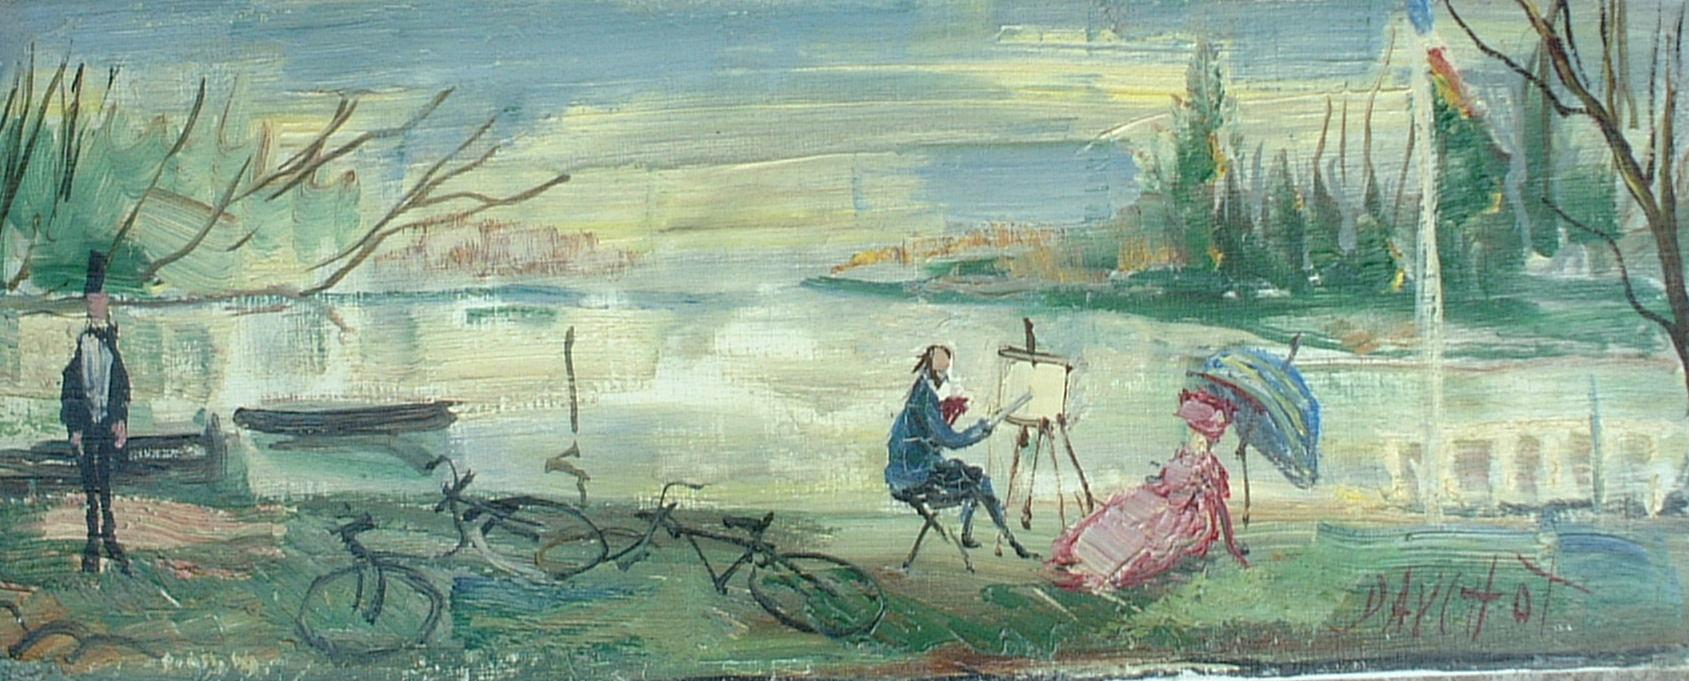 Artist: Gabriel Dauchot Title: The Artist Muse Size: 7.5in x 18.5in